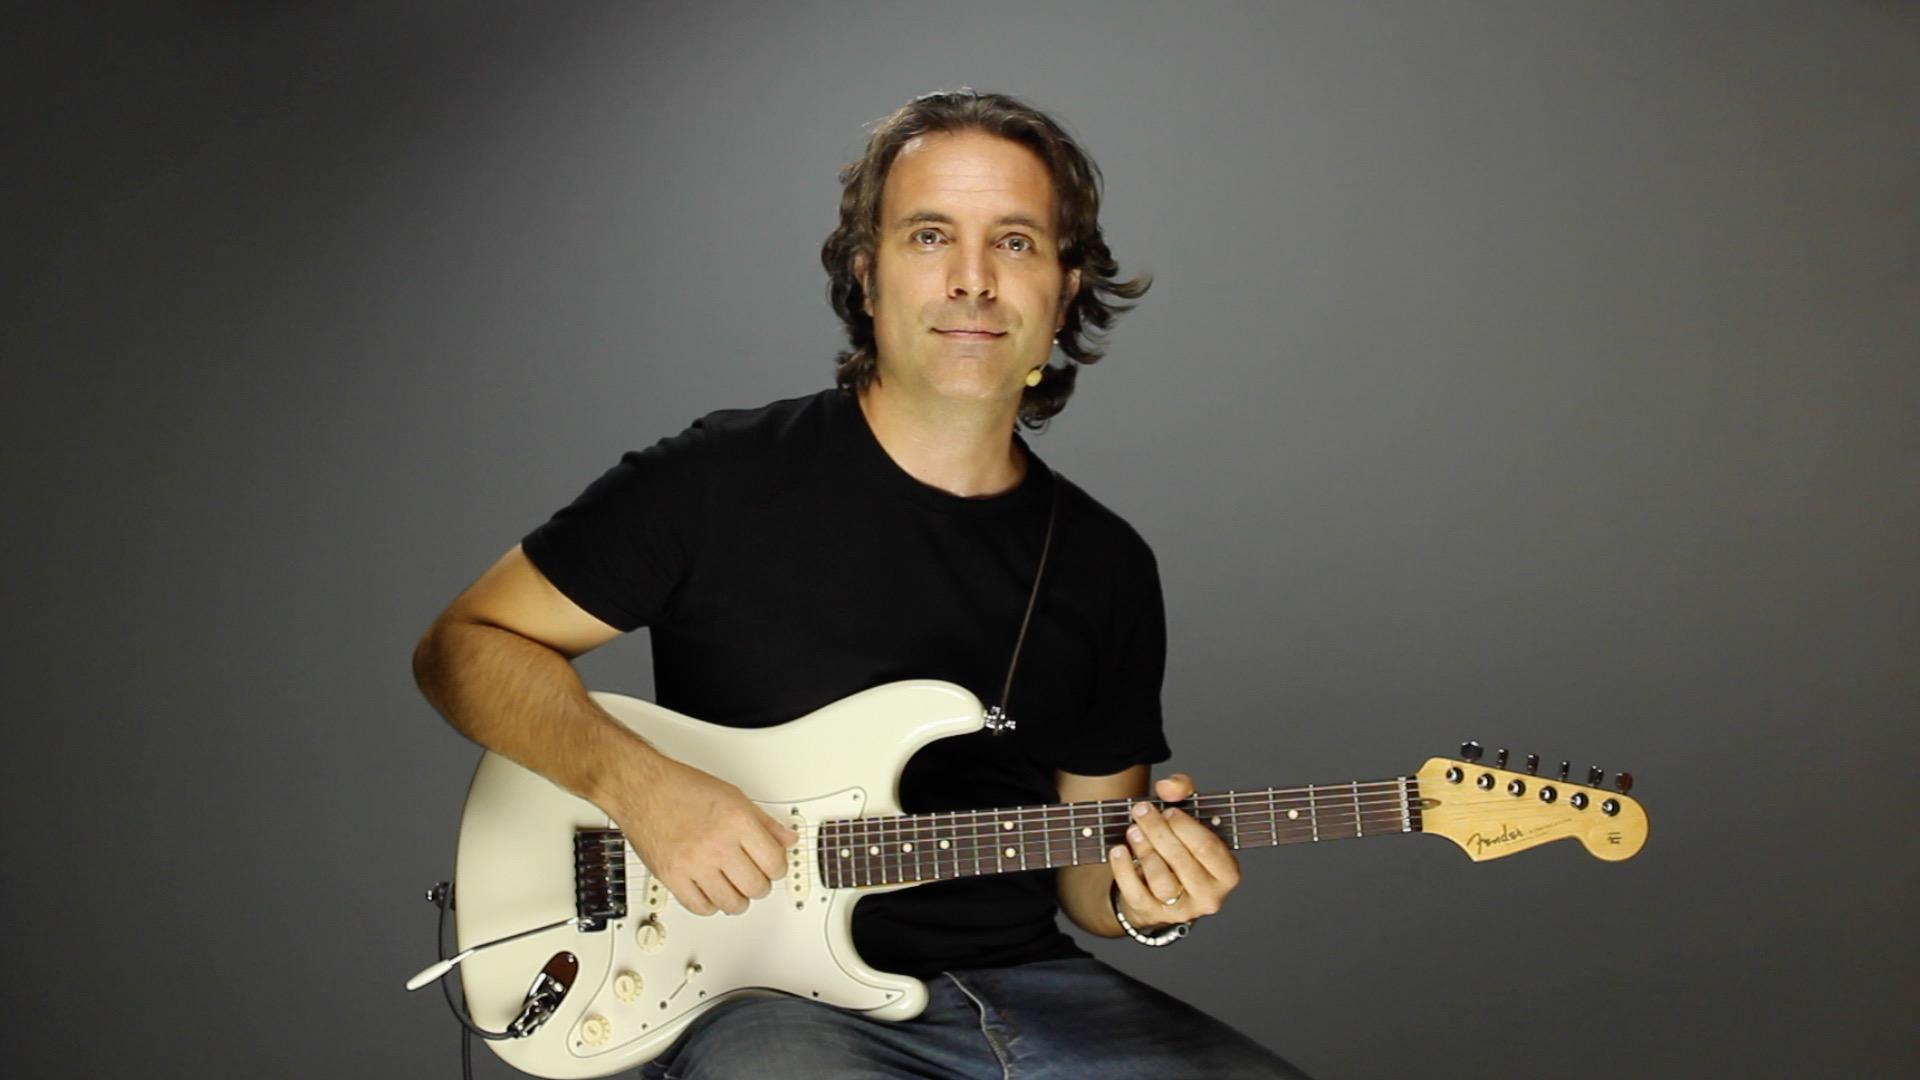 Alessandro Giordani